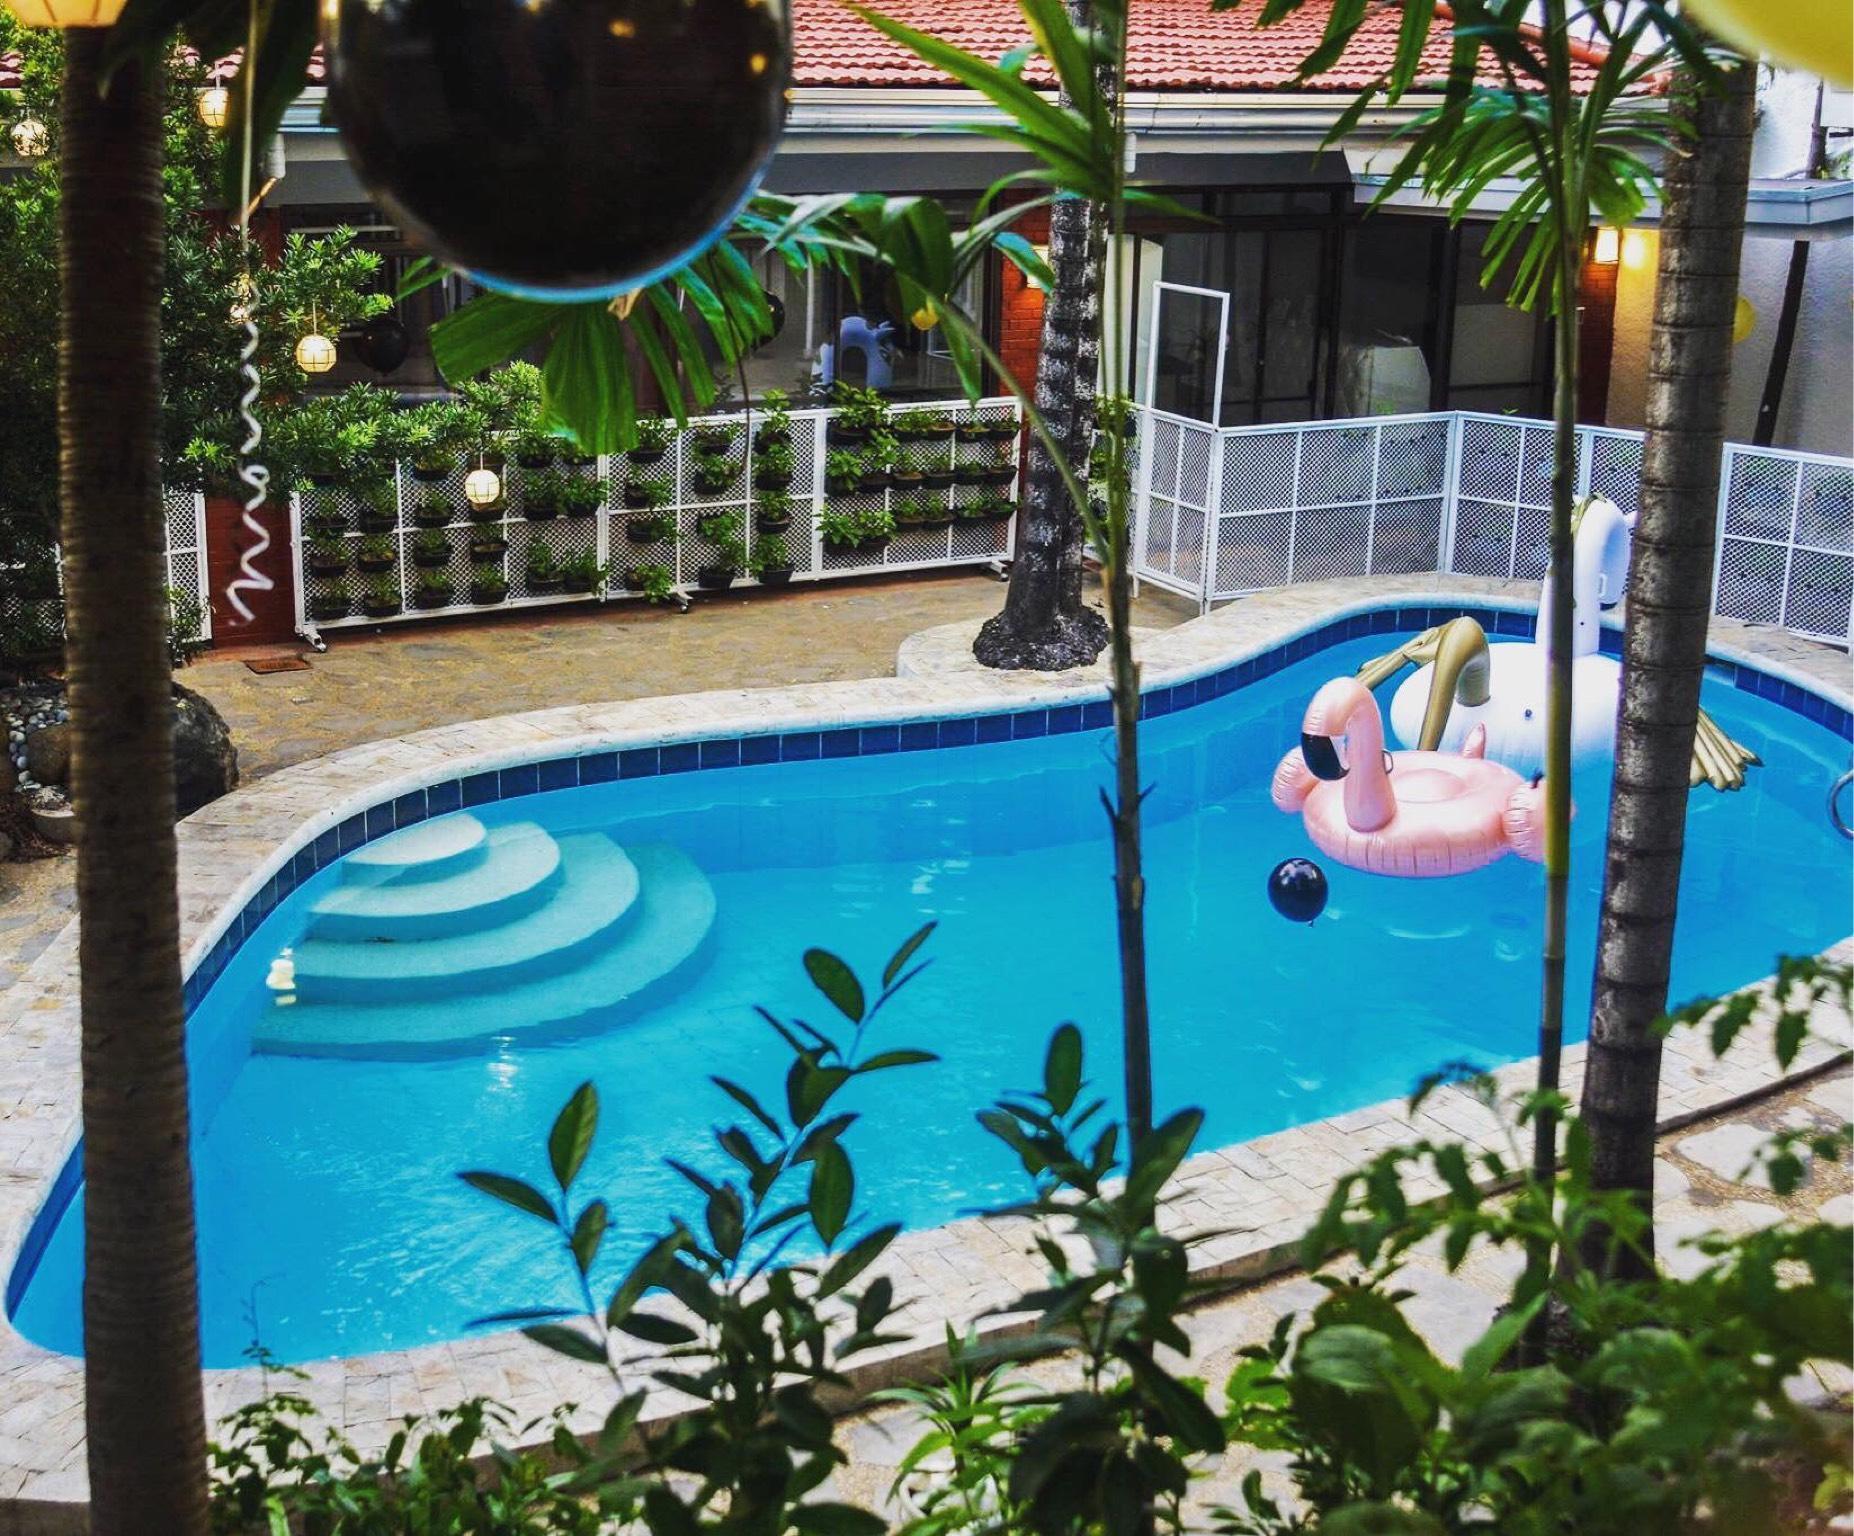 Private Swimming Pool Farm Garden With Open Gazebo